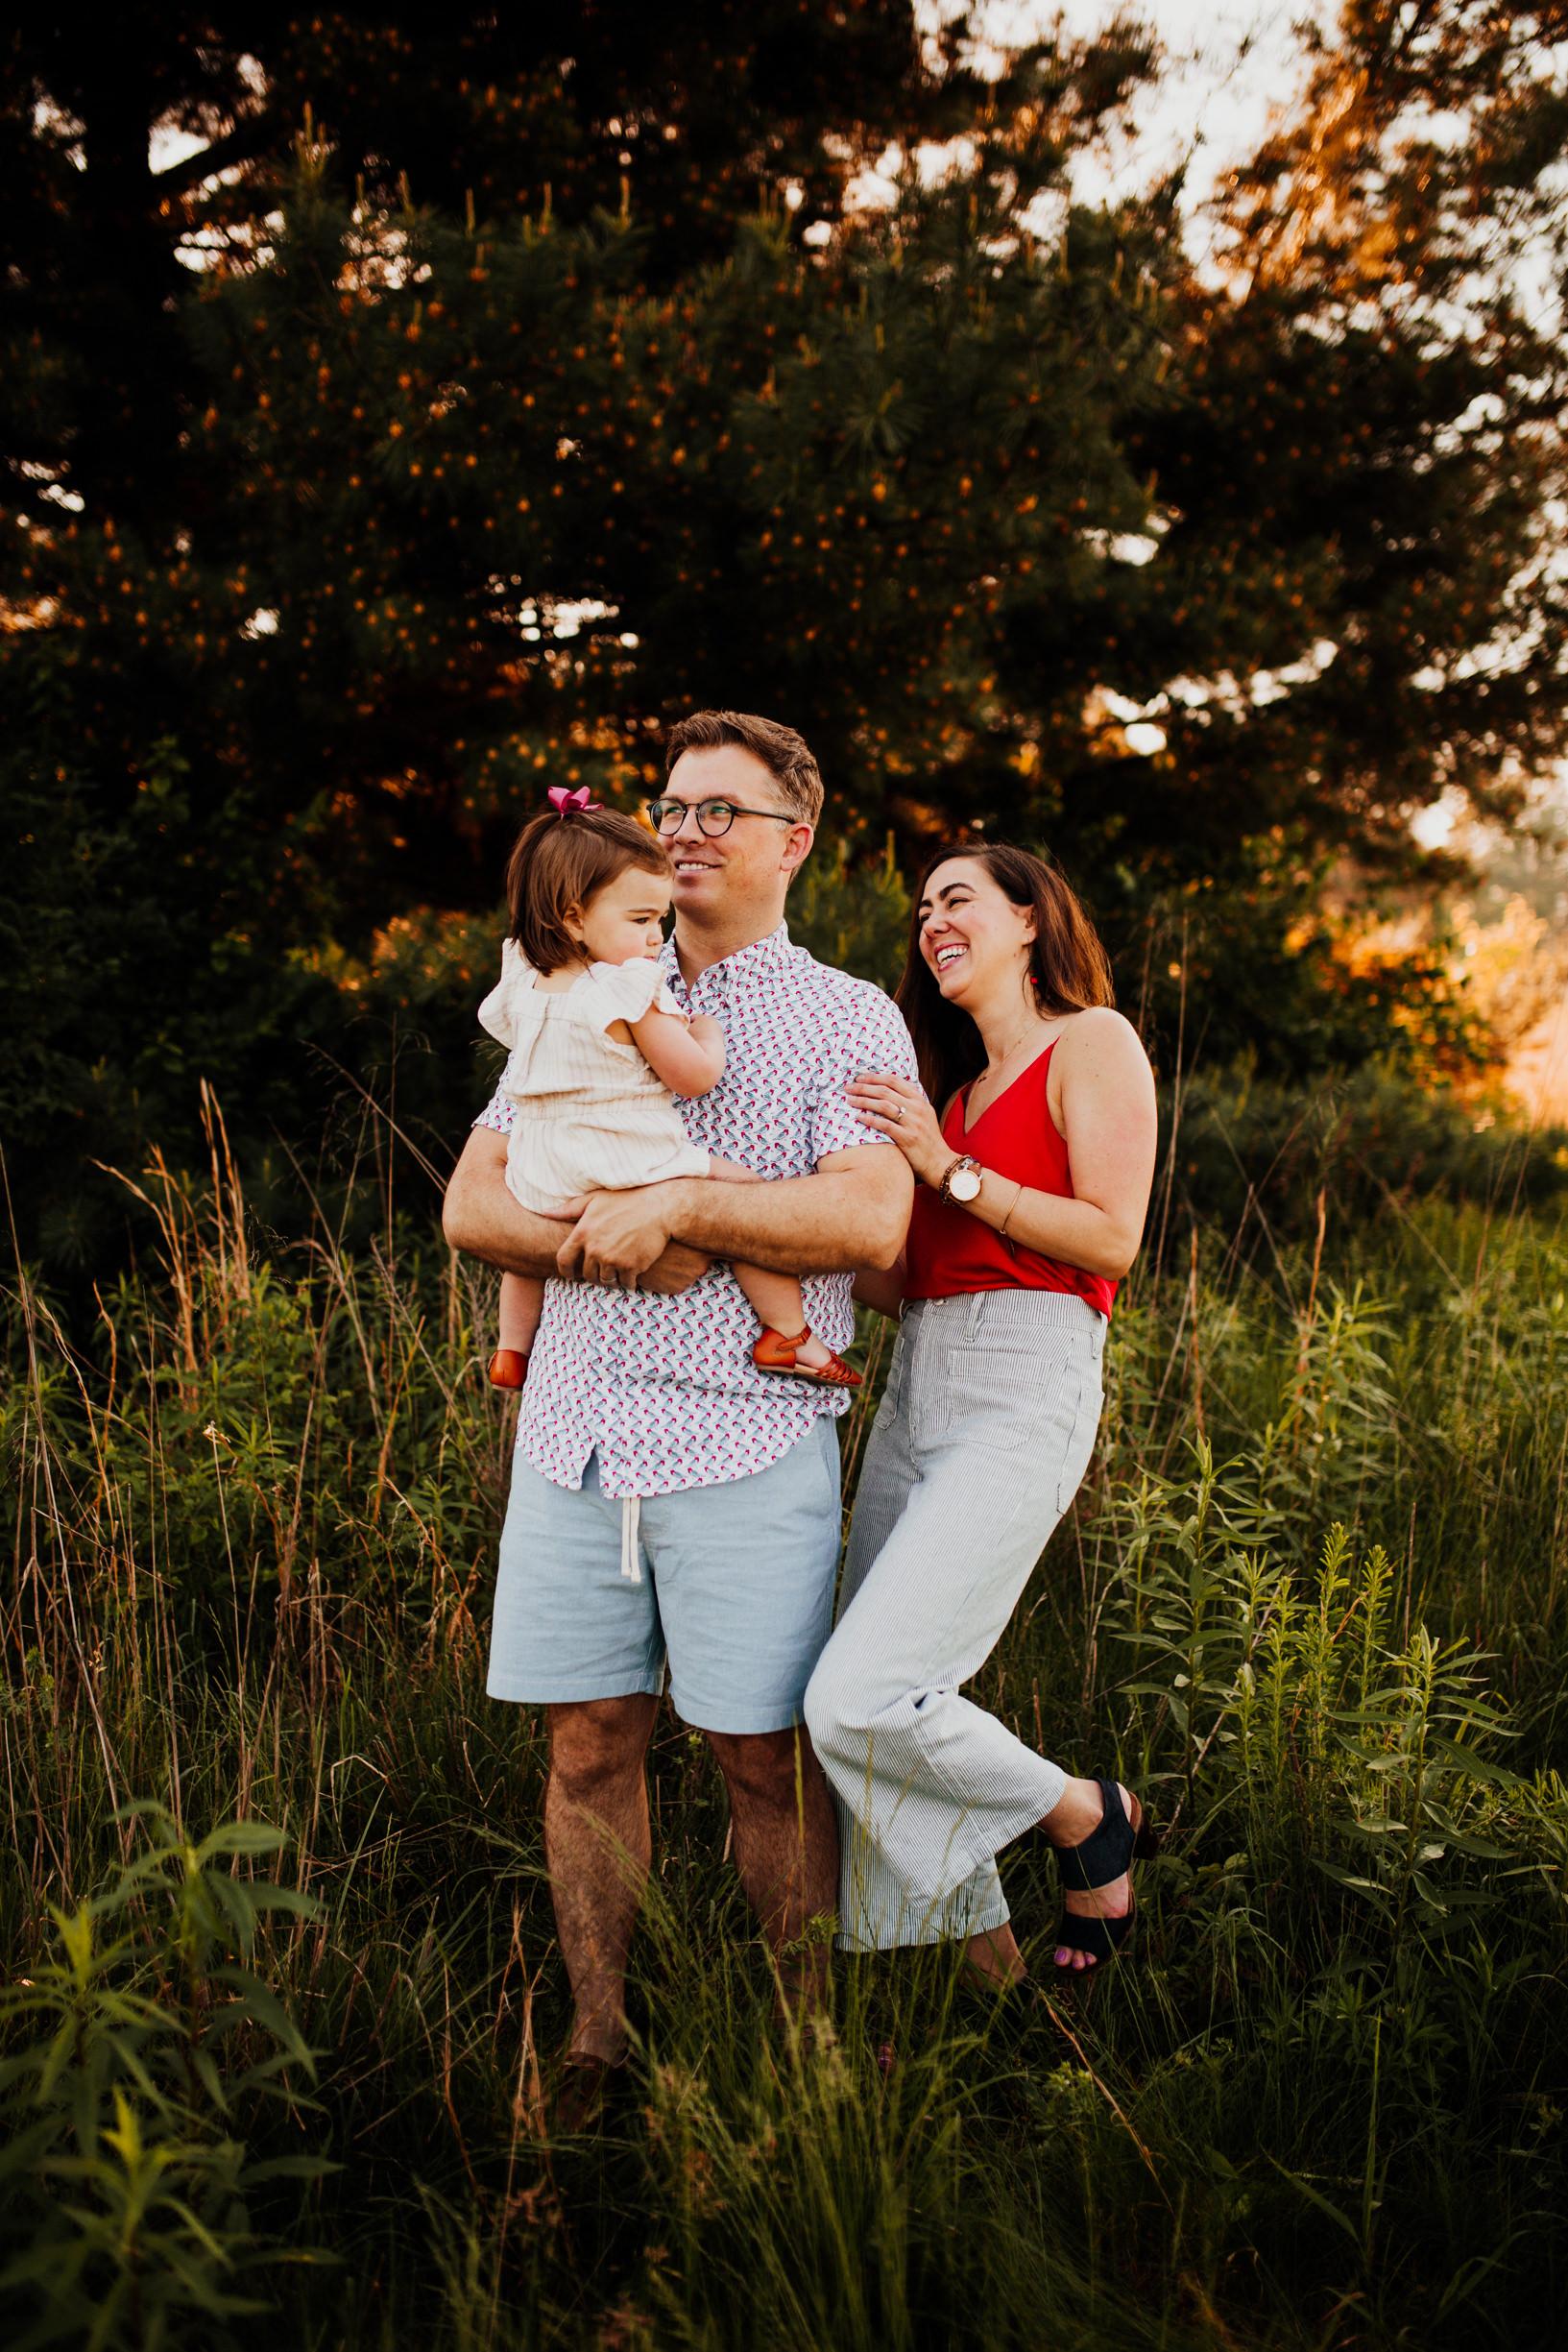 louisville-family-photographer-kentucky-crystal-ludwick-photo (9 of 45).jpg